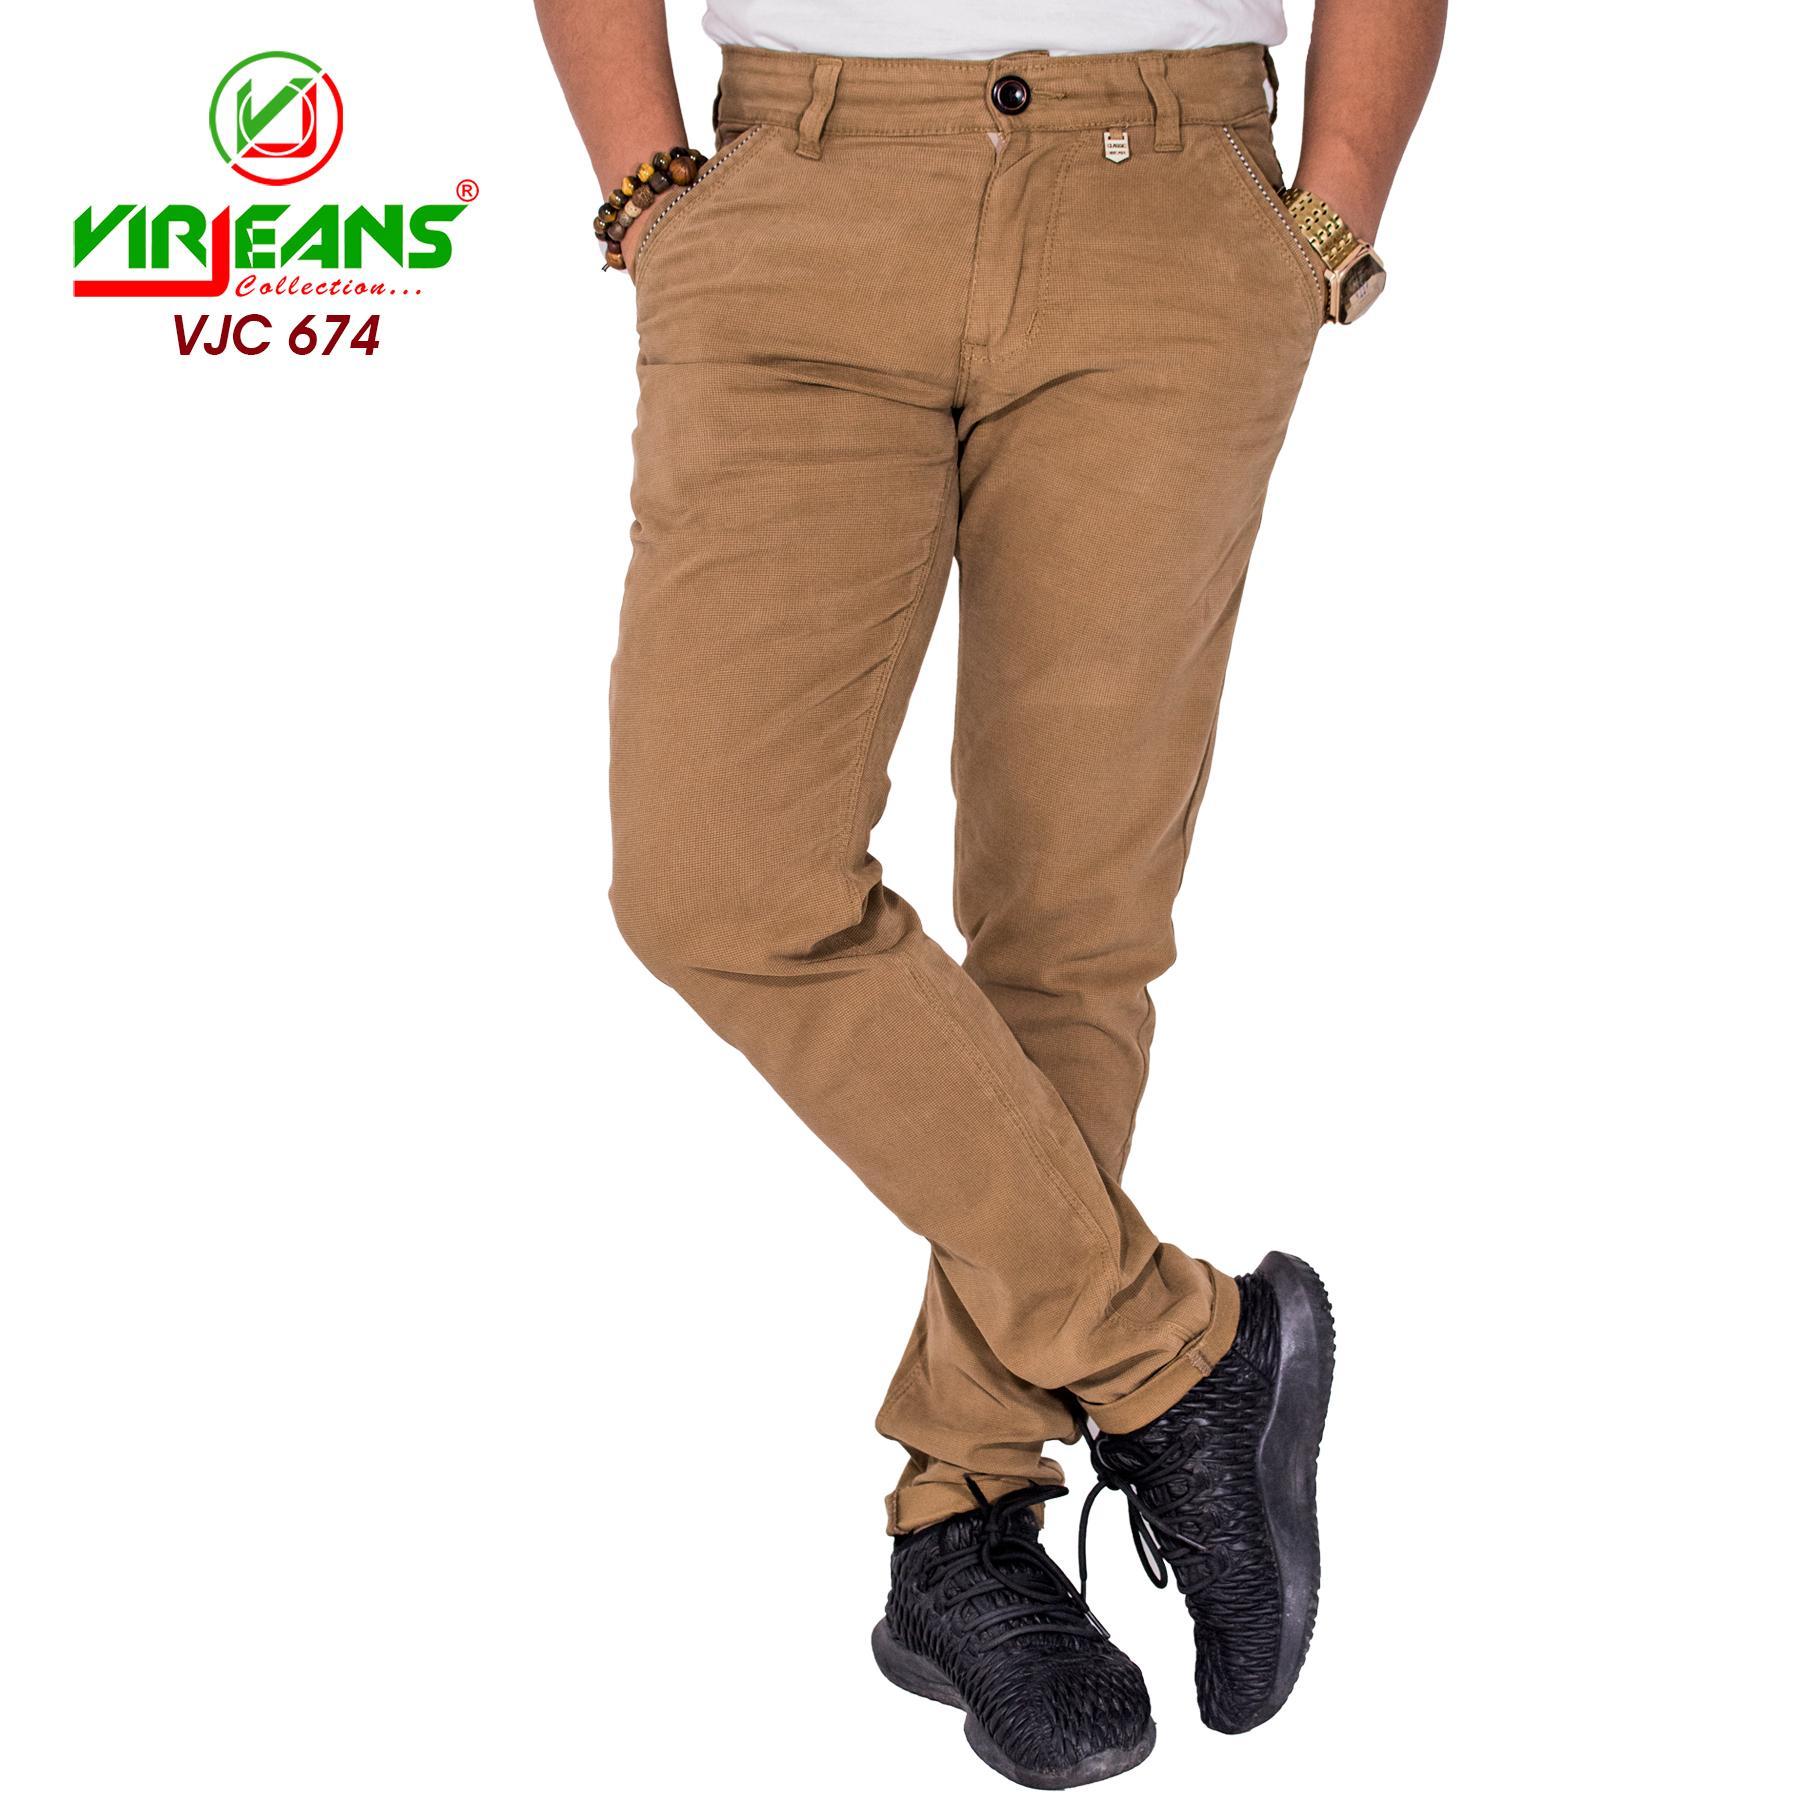 Virjeans Stretchable Twill Cotton Skinny Choose Pants For Men (VJC